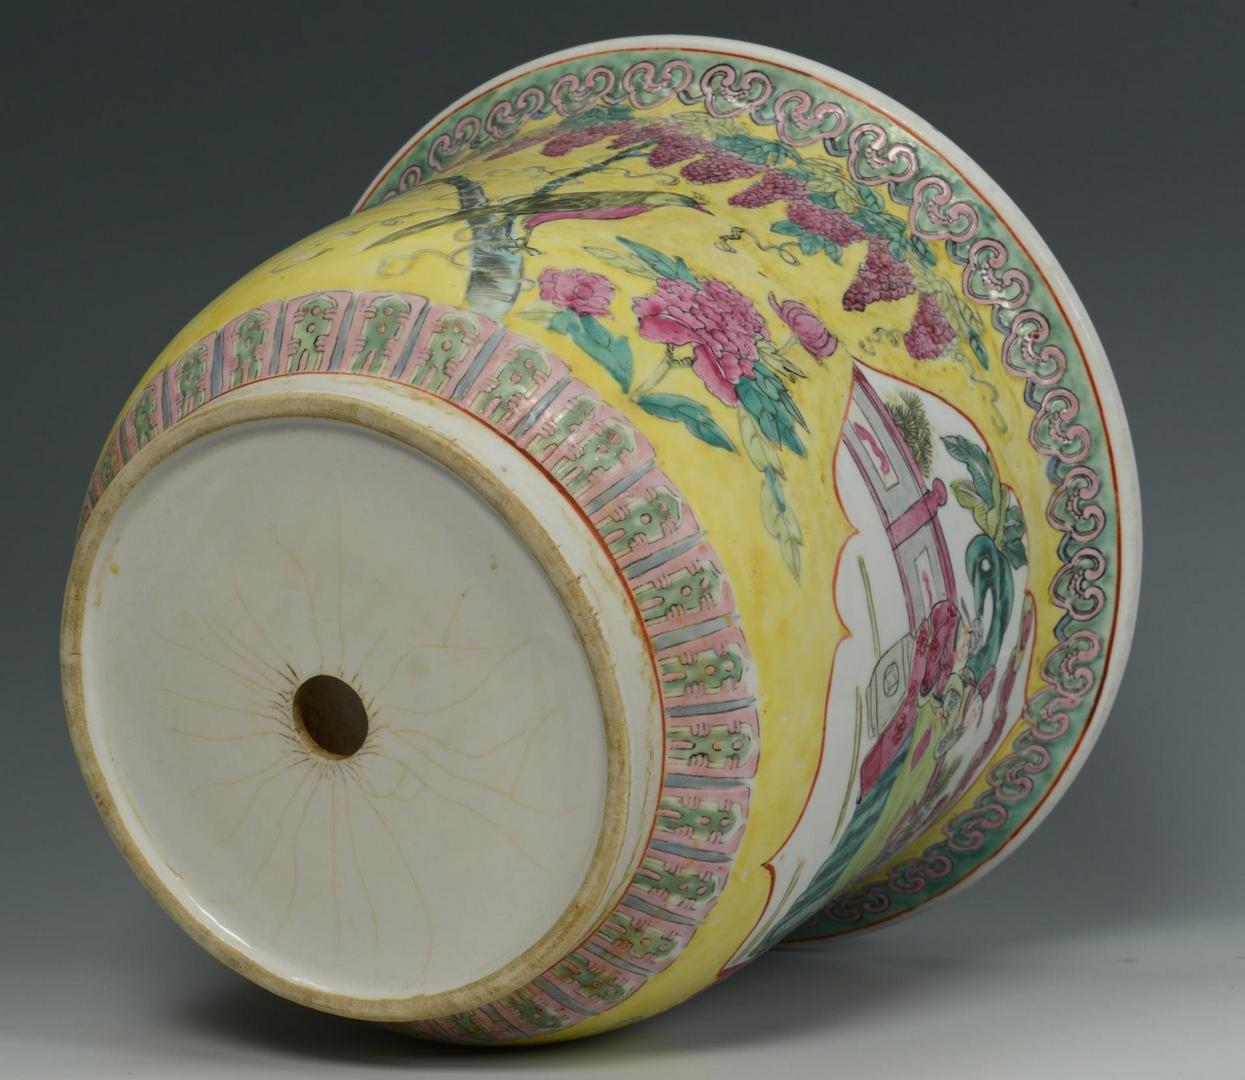 Lot 3832466: 2 Chinese Ceramic Decorative items